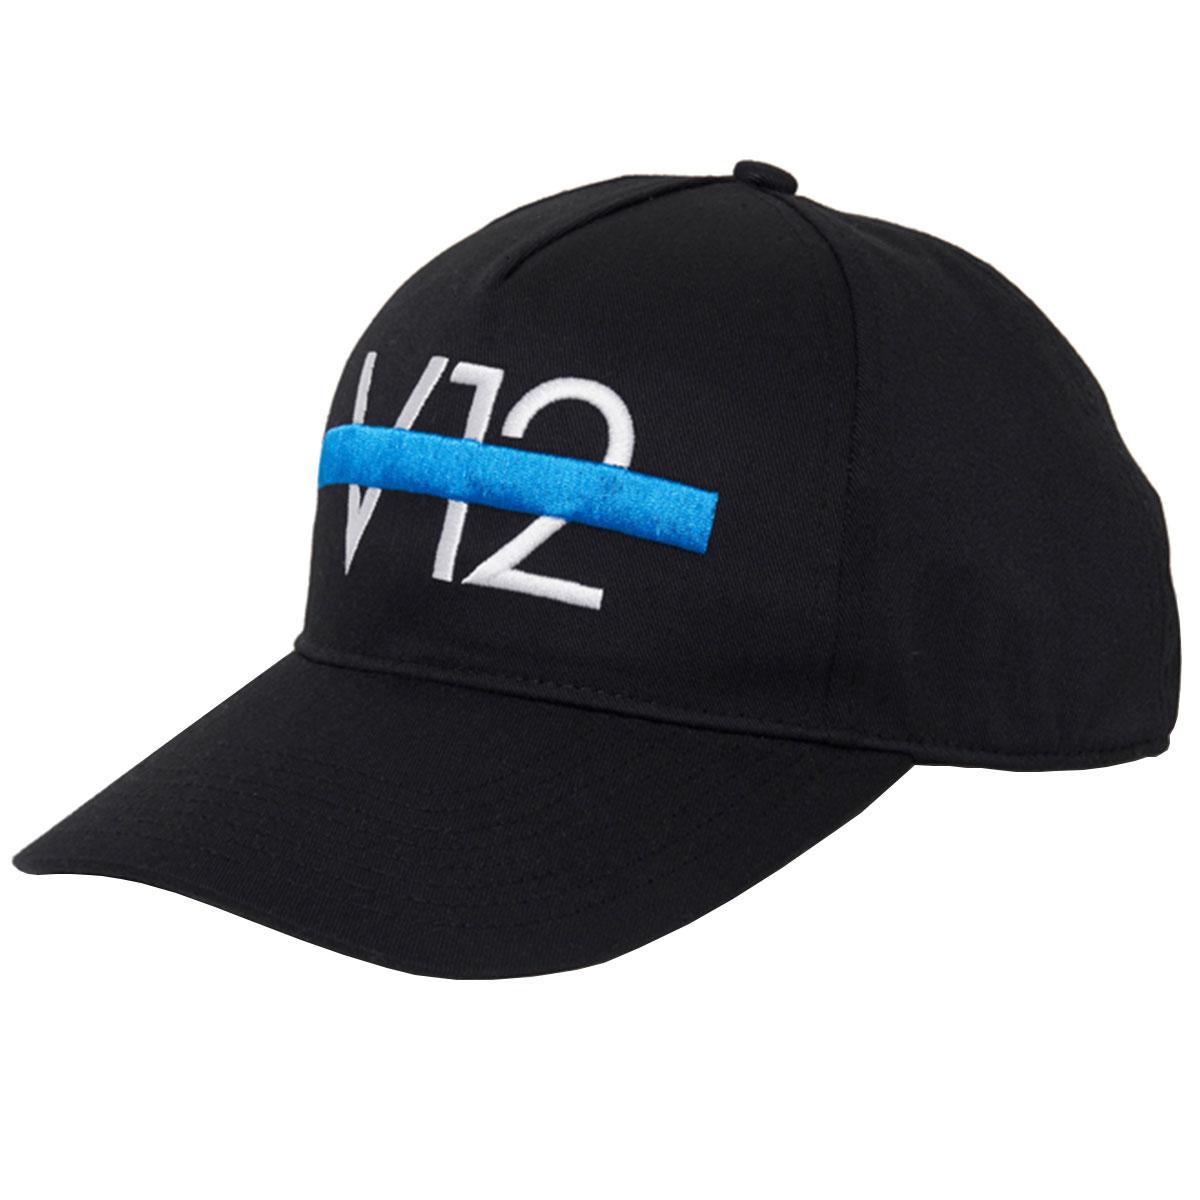 NO V12 キャップ